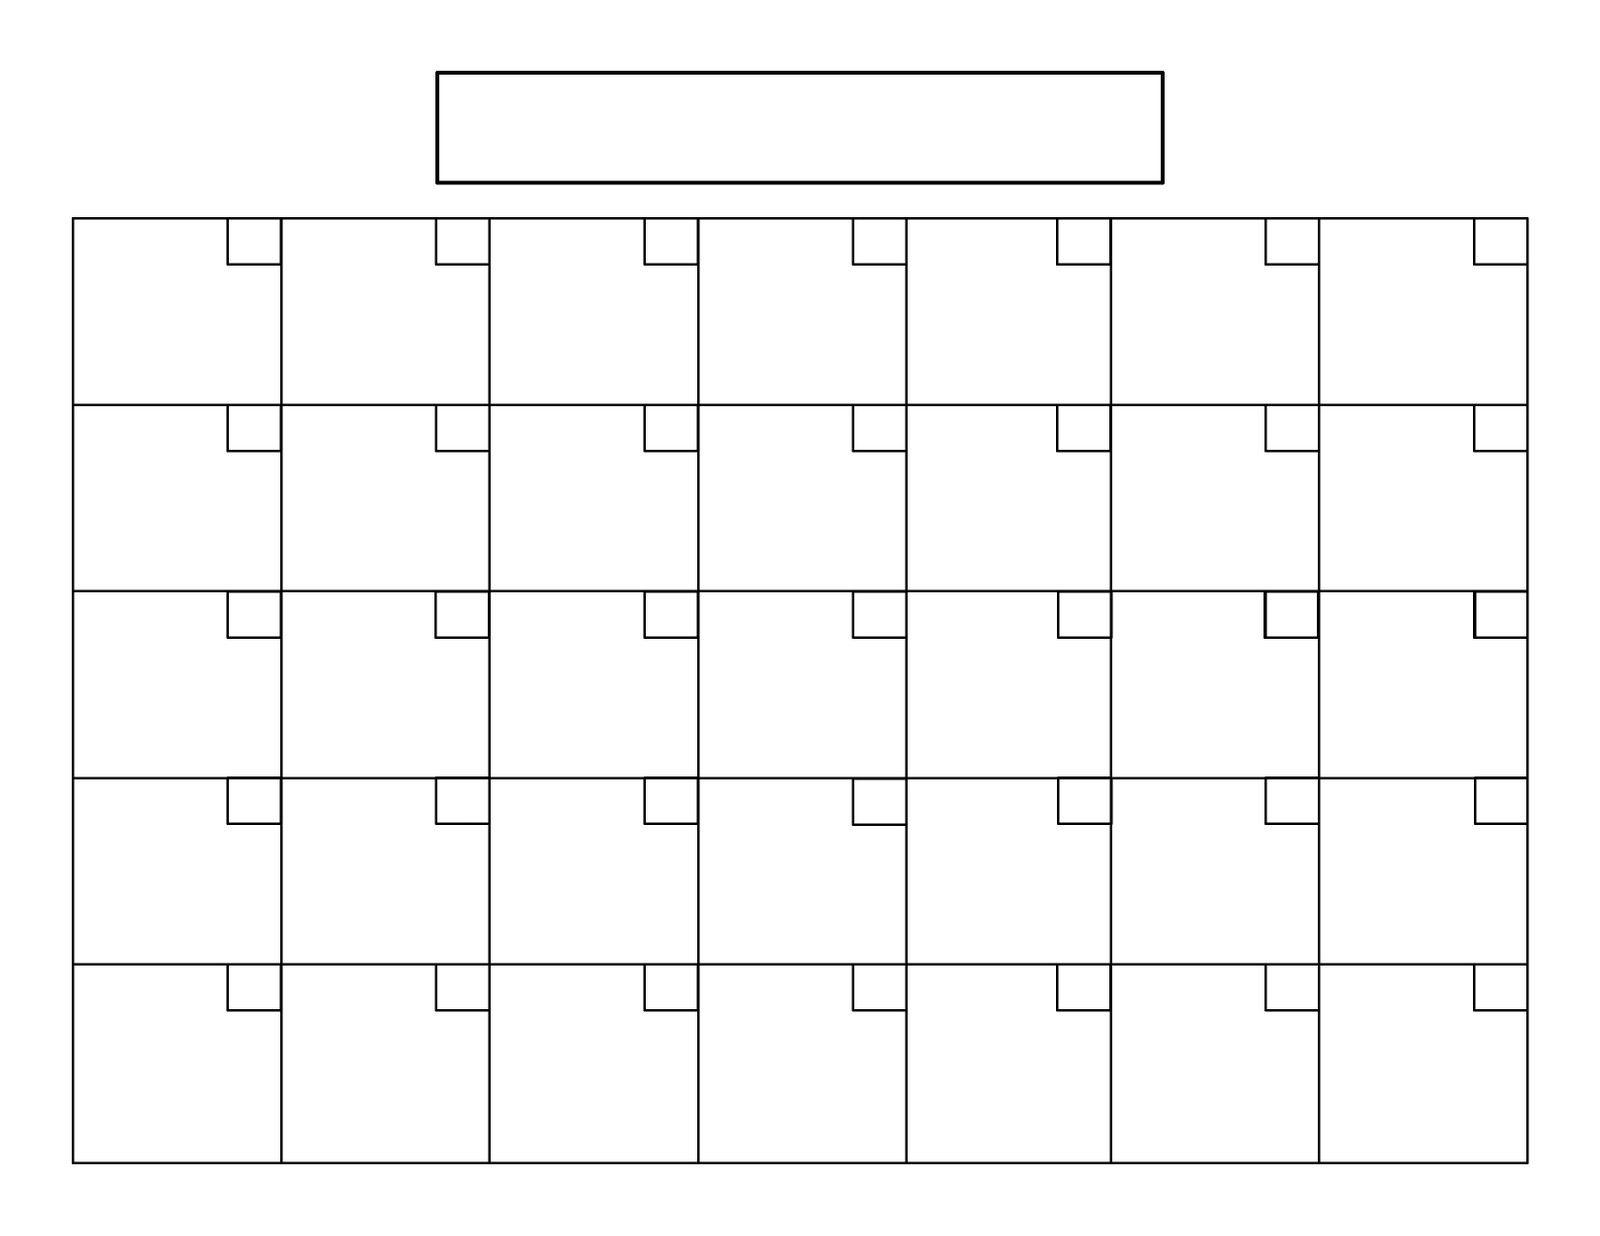 8 X 11 Calendar Printable - Colona.rsd7 Remarkable 8.5 X 11 Calendar Print